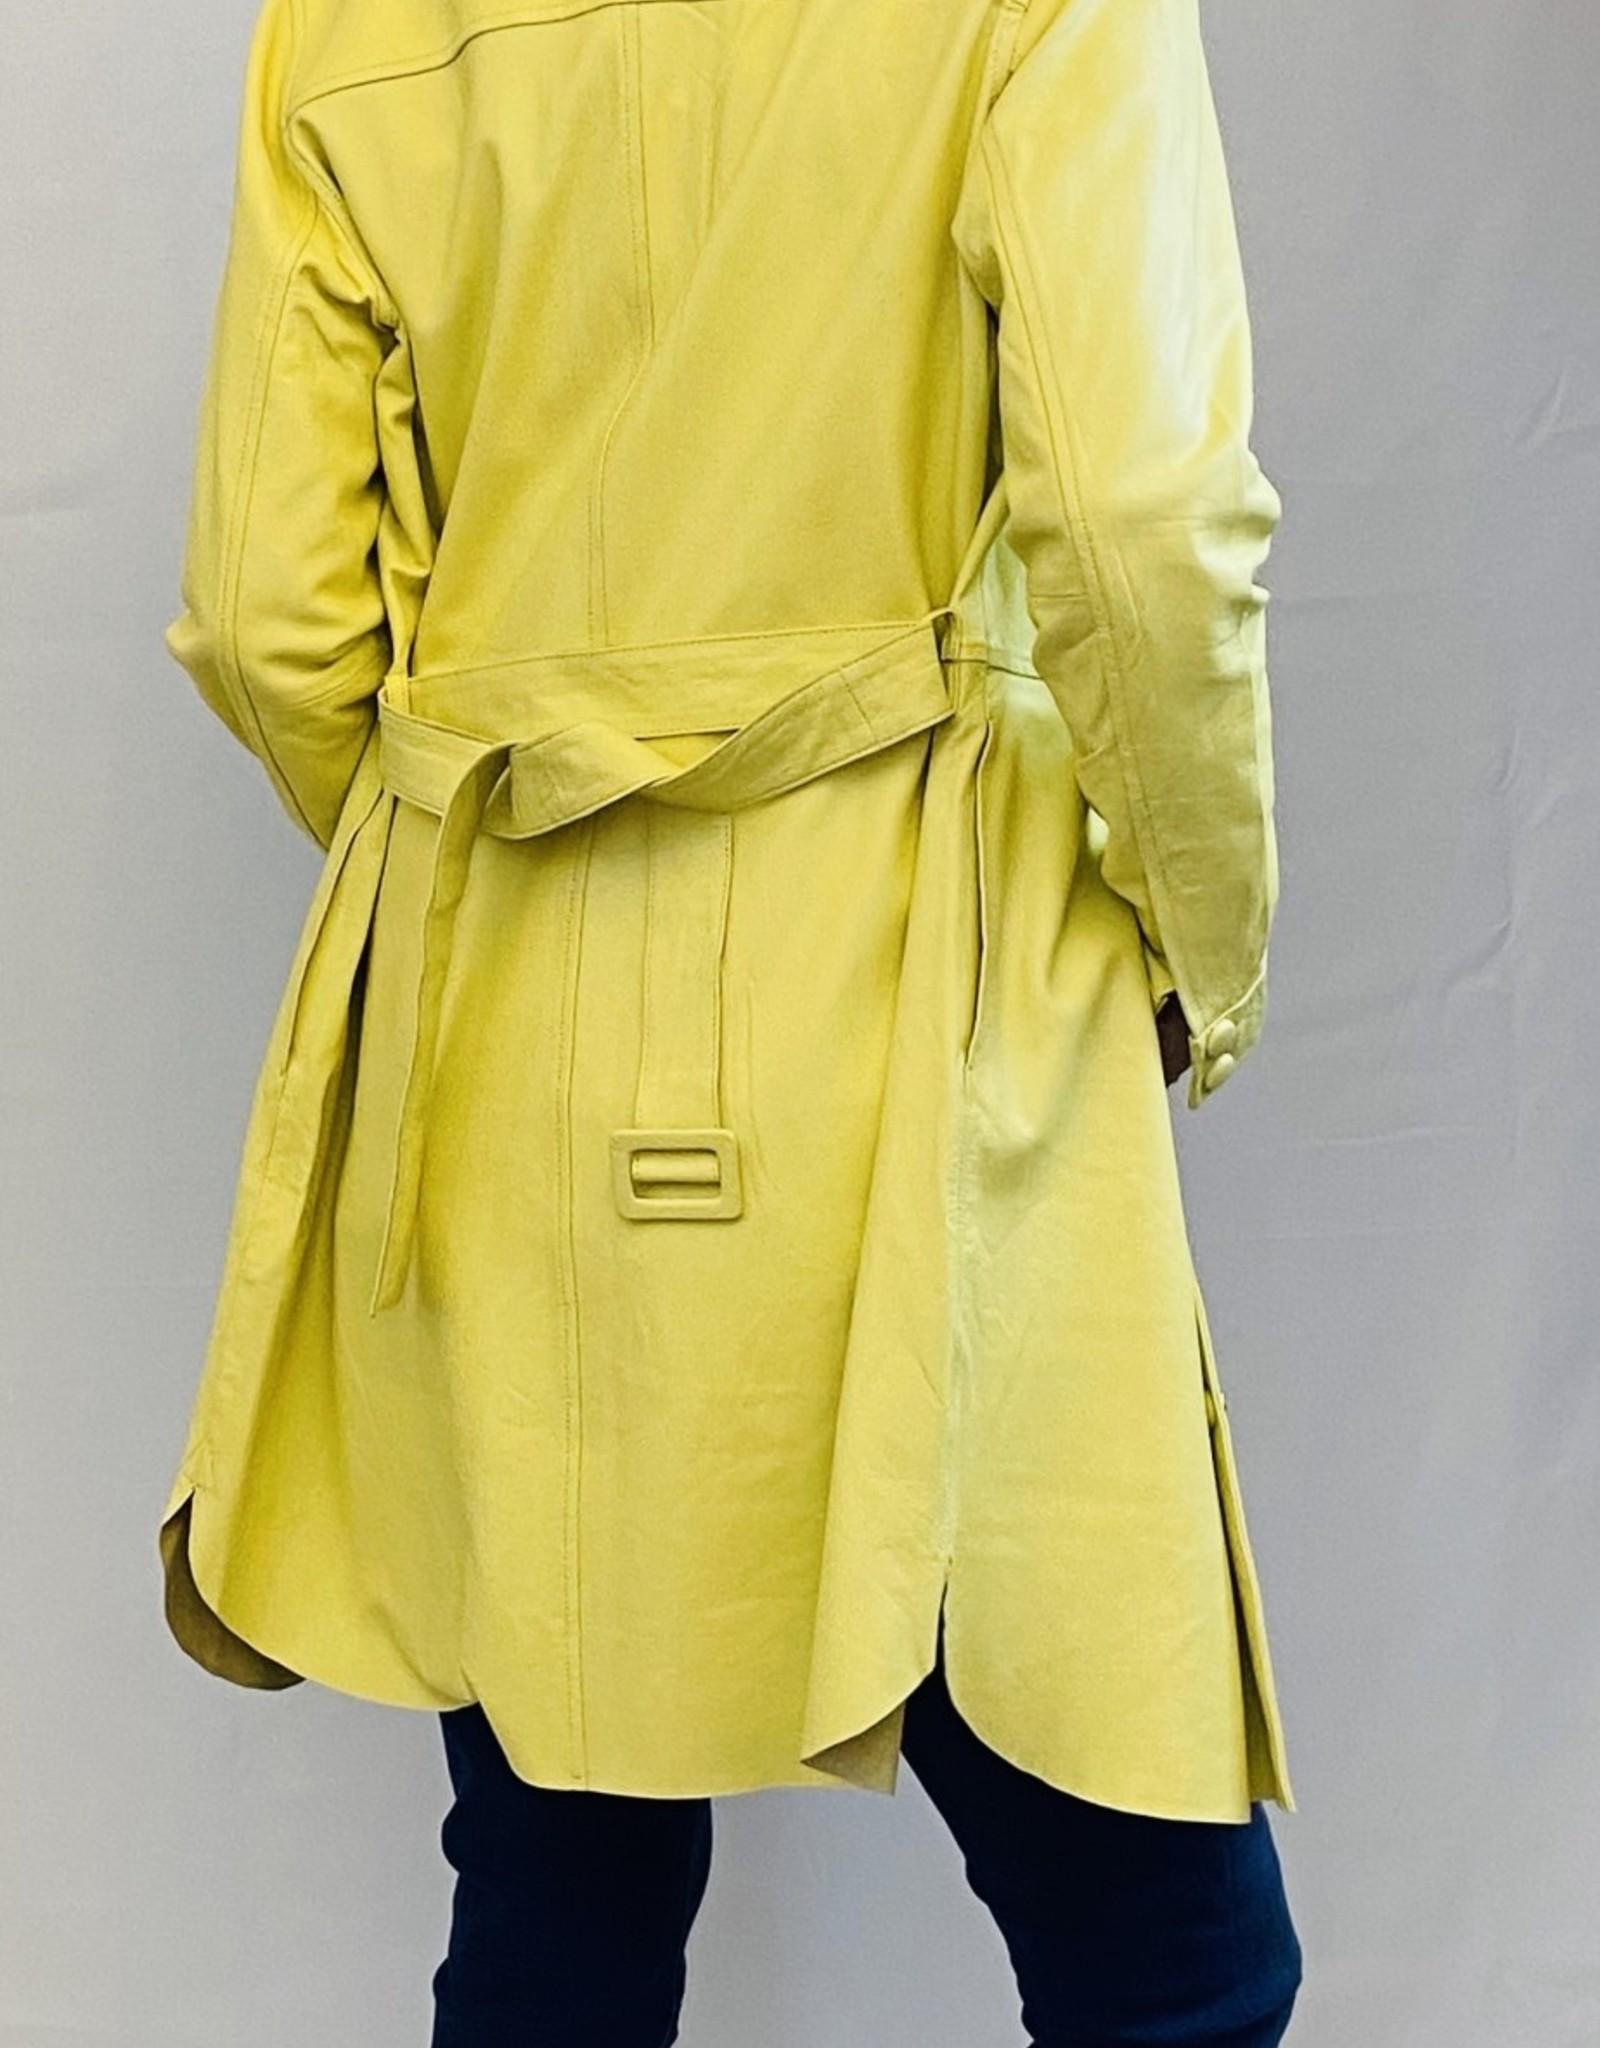 COSTER COPENHAGEN LEATHER  DRESS / JACKET WITH BELT 201-6170